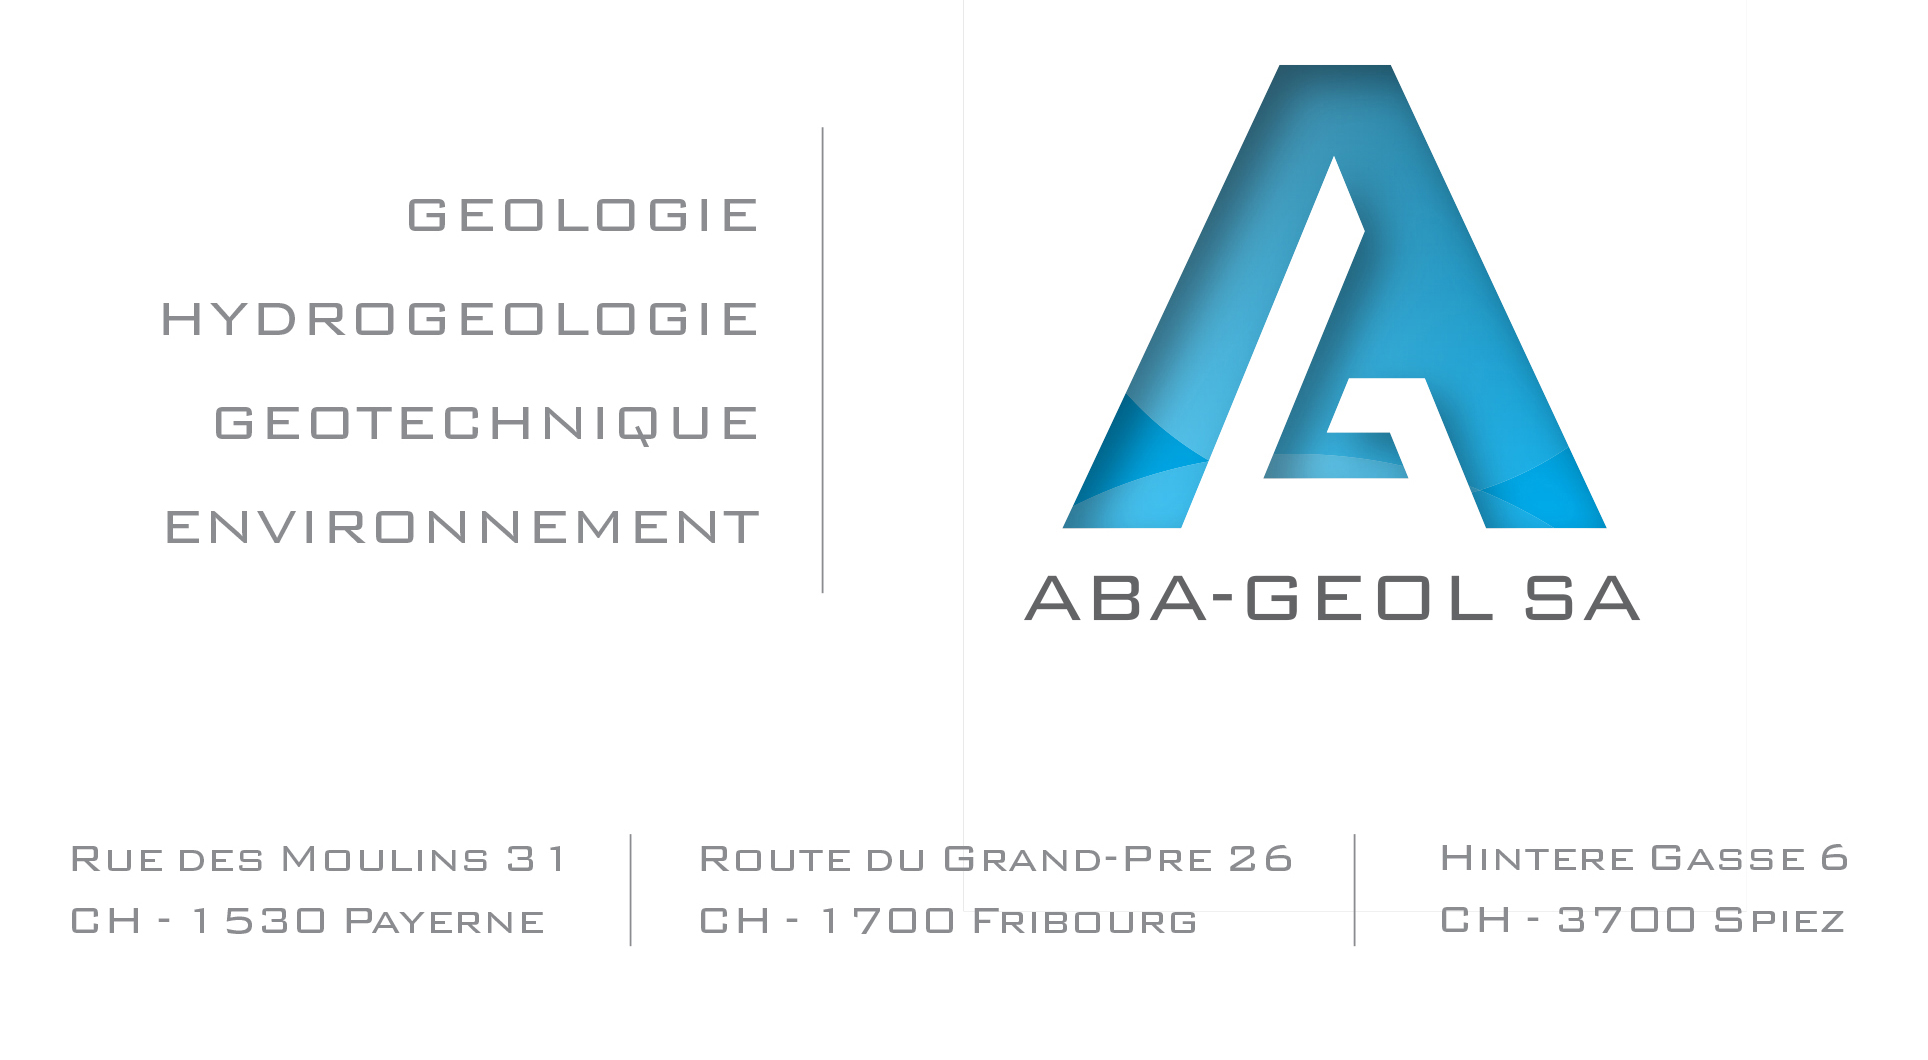 https://www.fcrichemond.ch/wp-content/uploads/2018/10/logo_AbaGeol.jpg